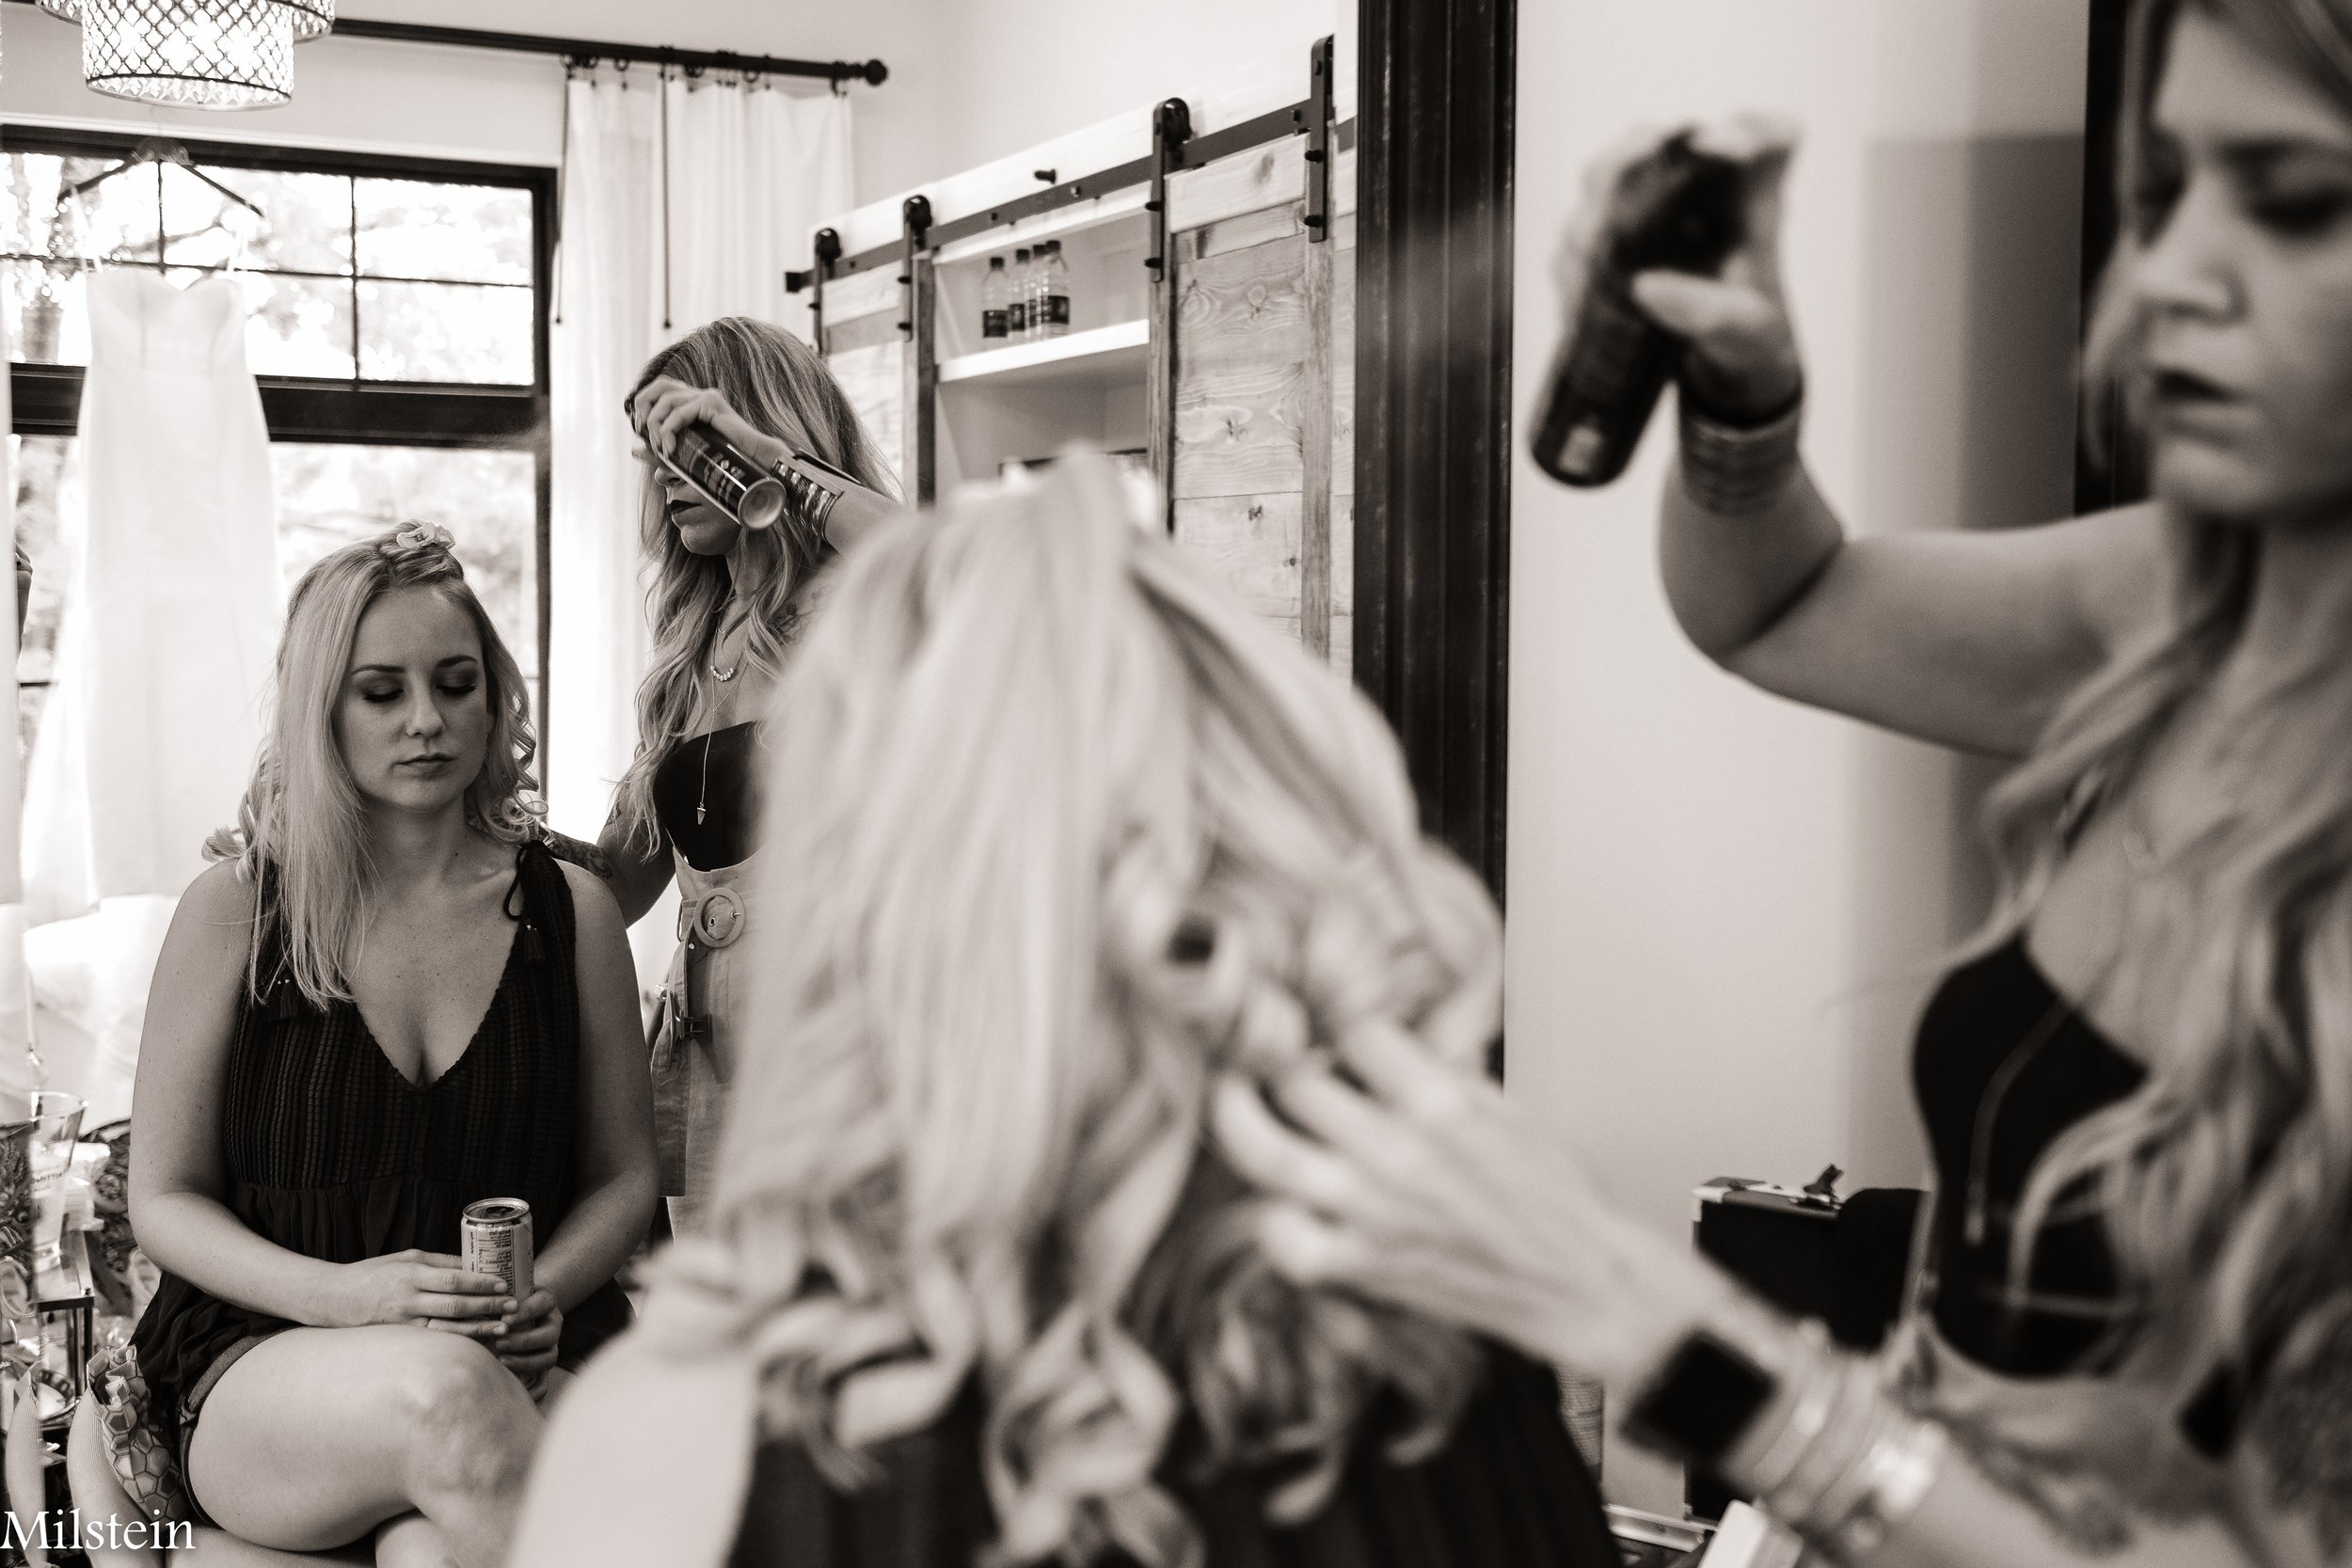 Amy-Milstein-Photographer-NY.jpg